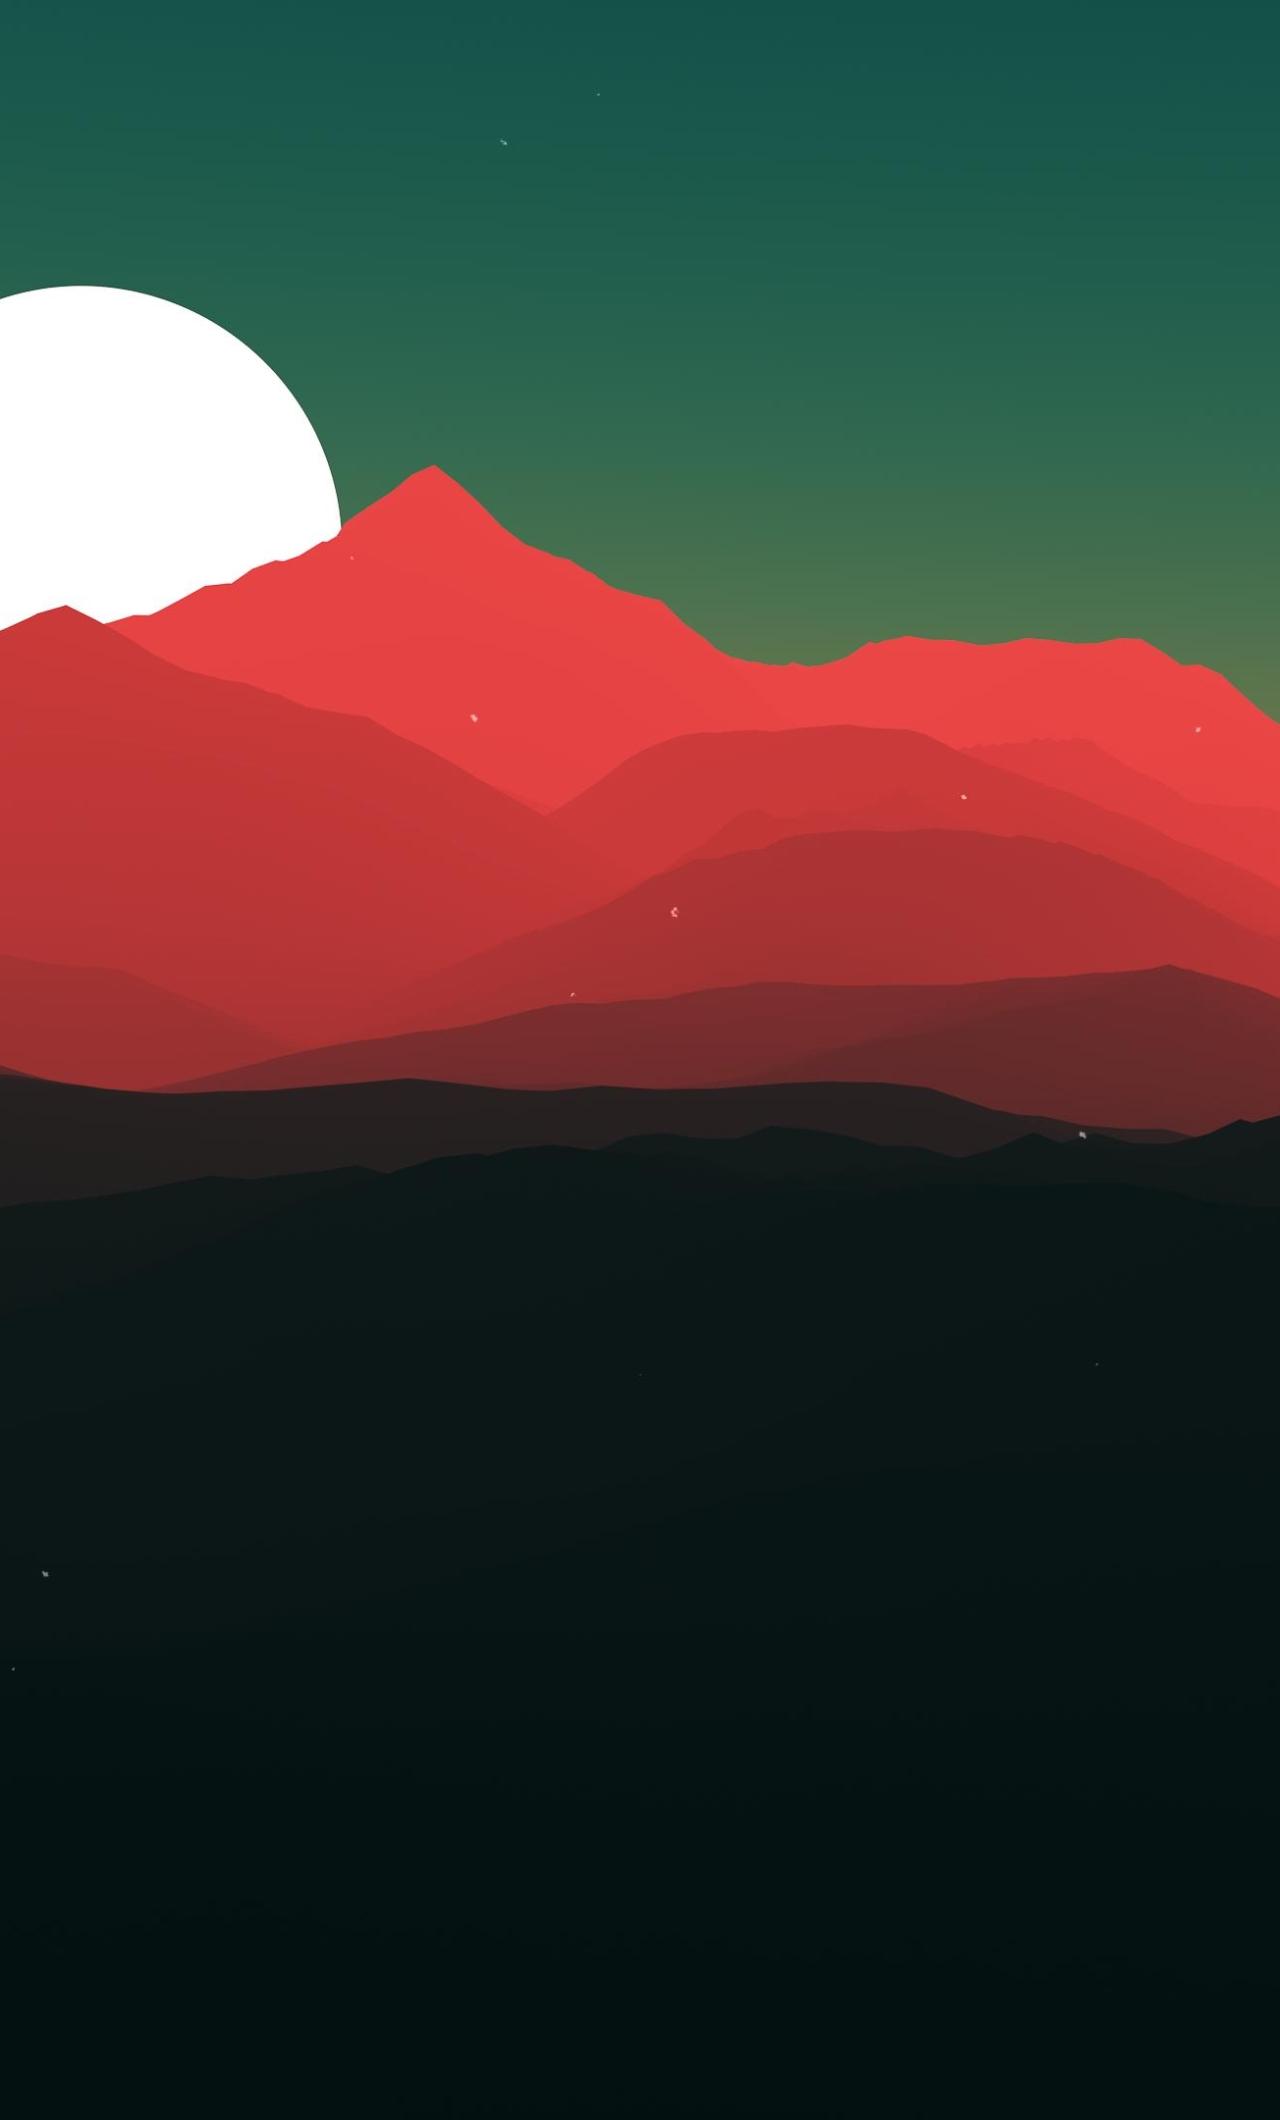 Minimalist Landscape, HD 4K Wallpaper